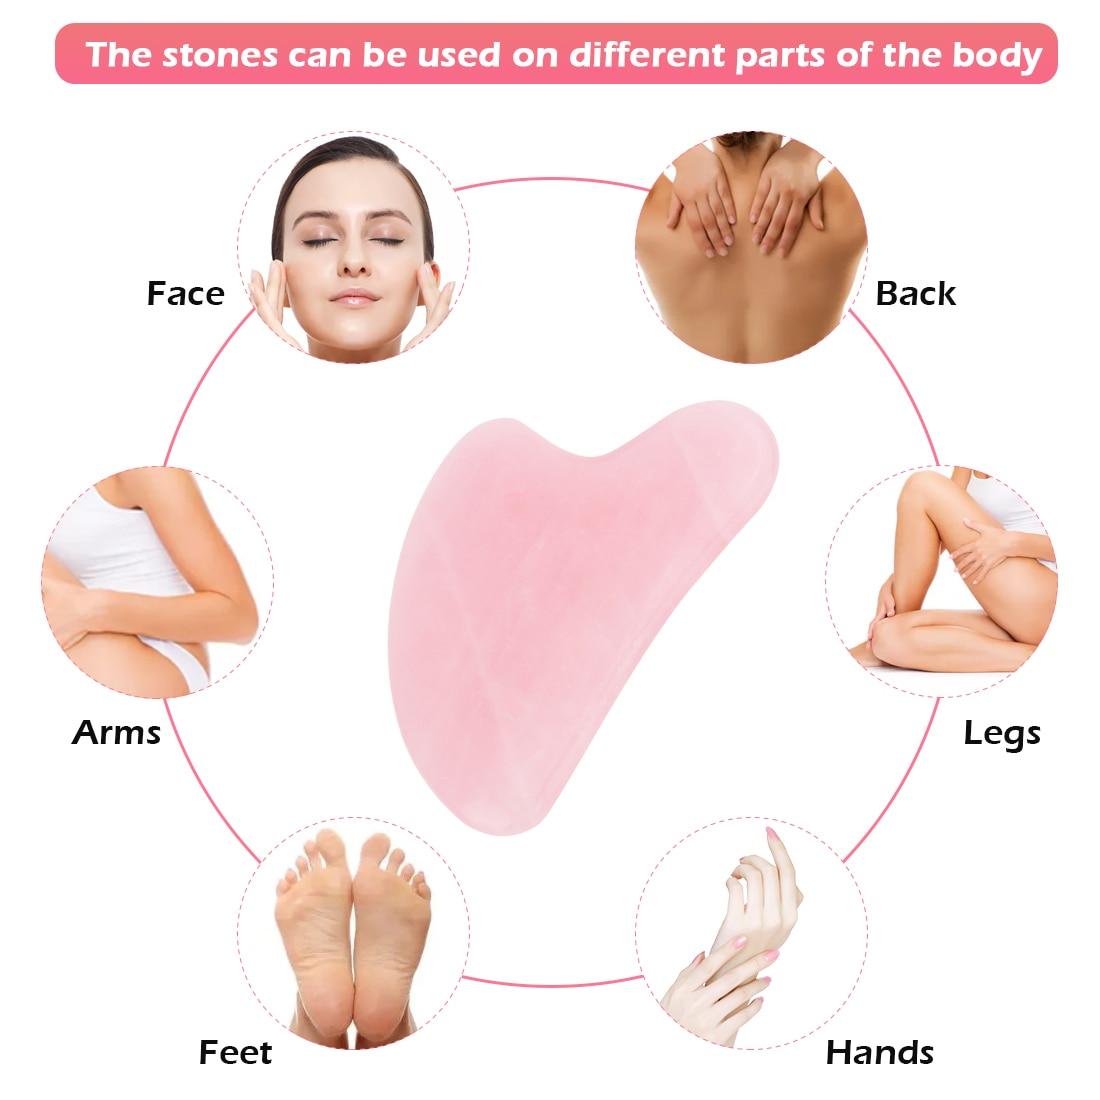 Rose Quartz Face Massager Gua Sha Scraper Natural Jade Stone Skin Care Massager for Body Facial Neck Back Beauty Health Eye SPA 5